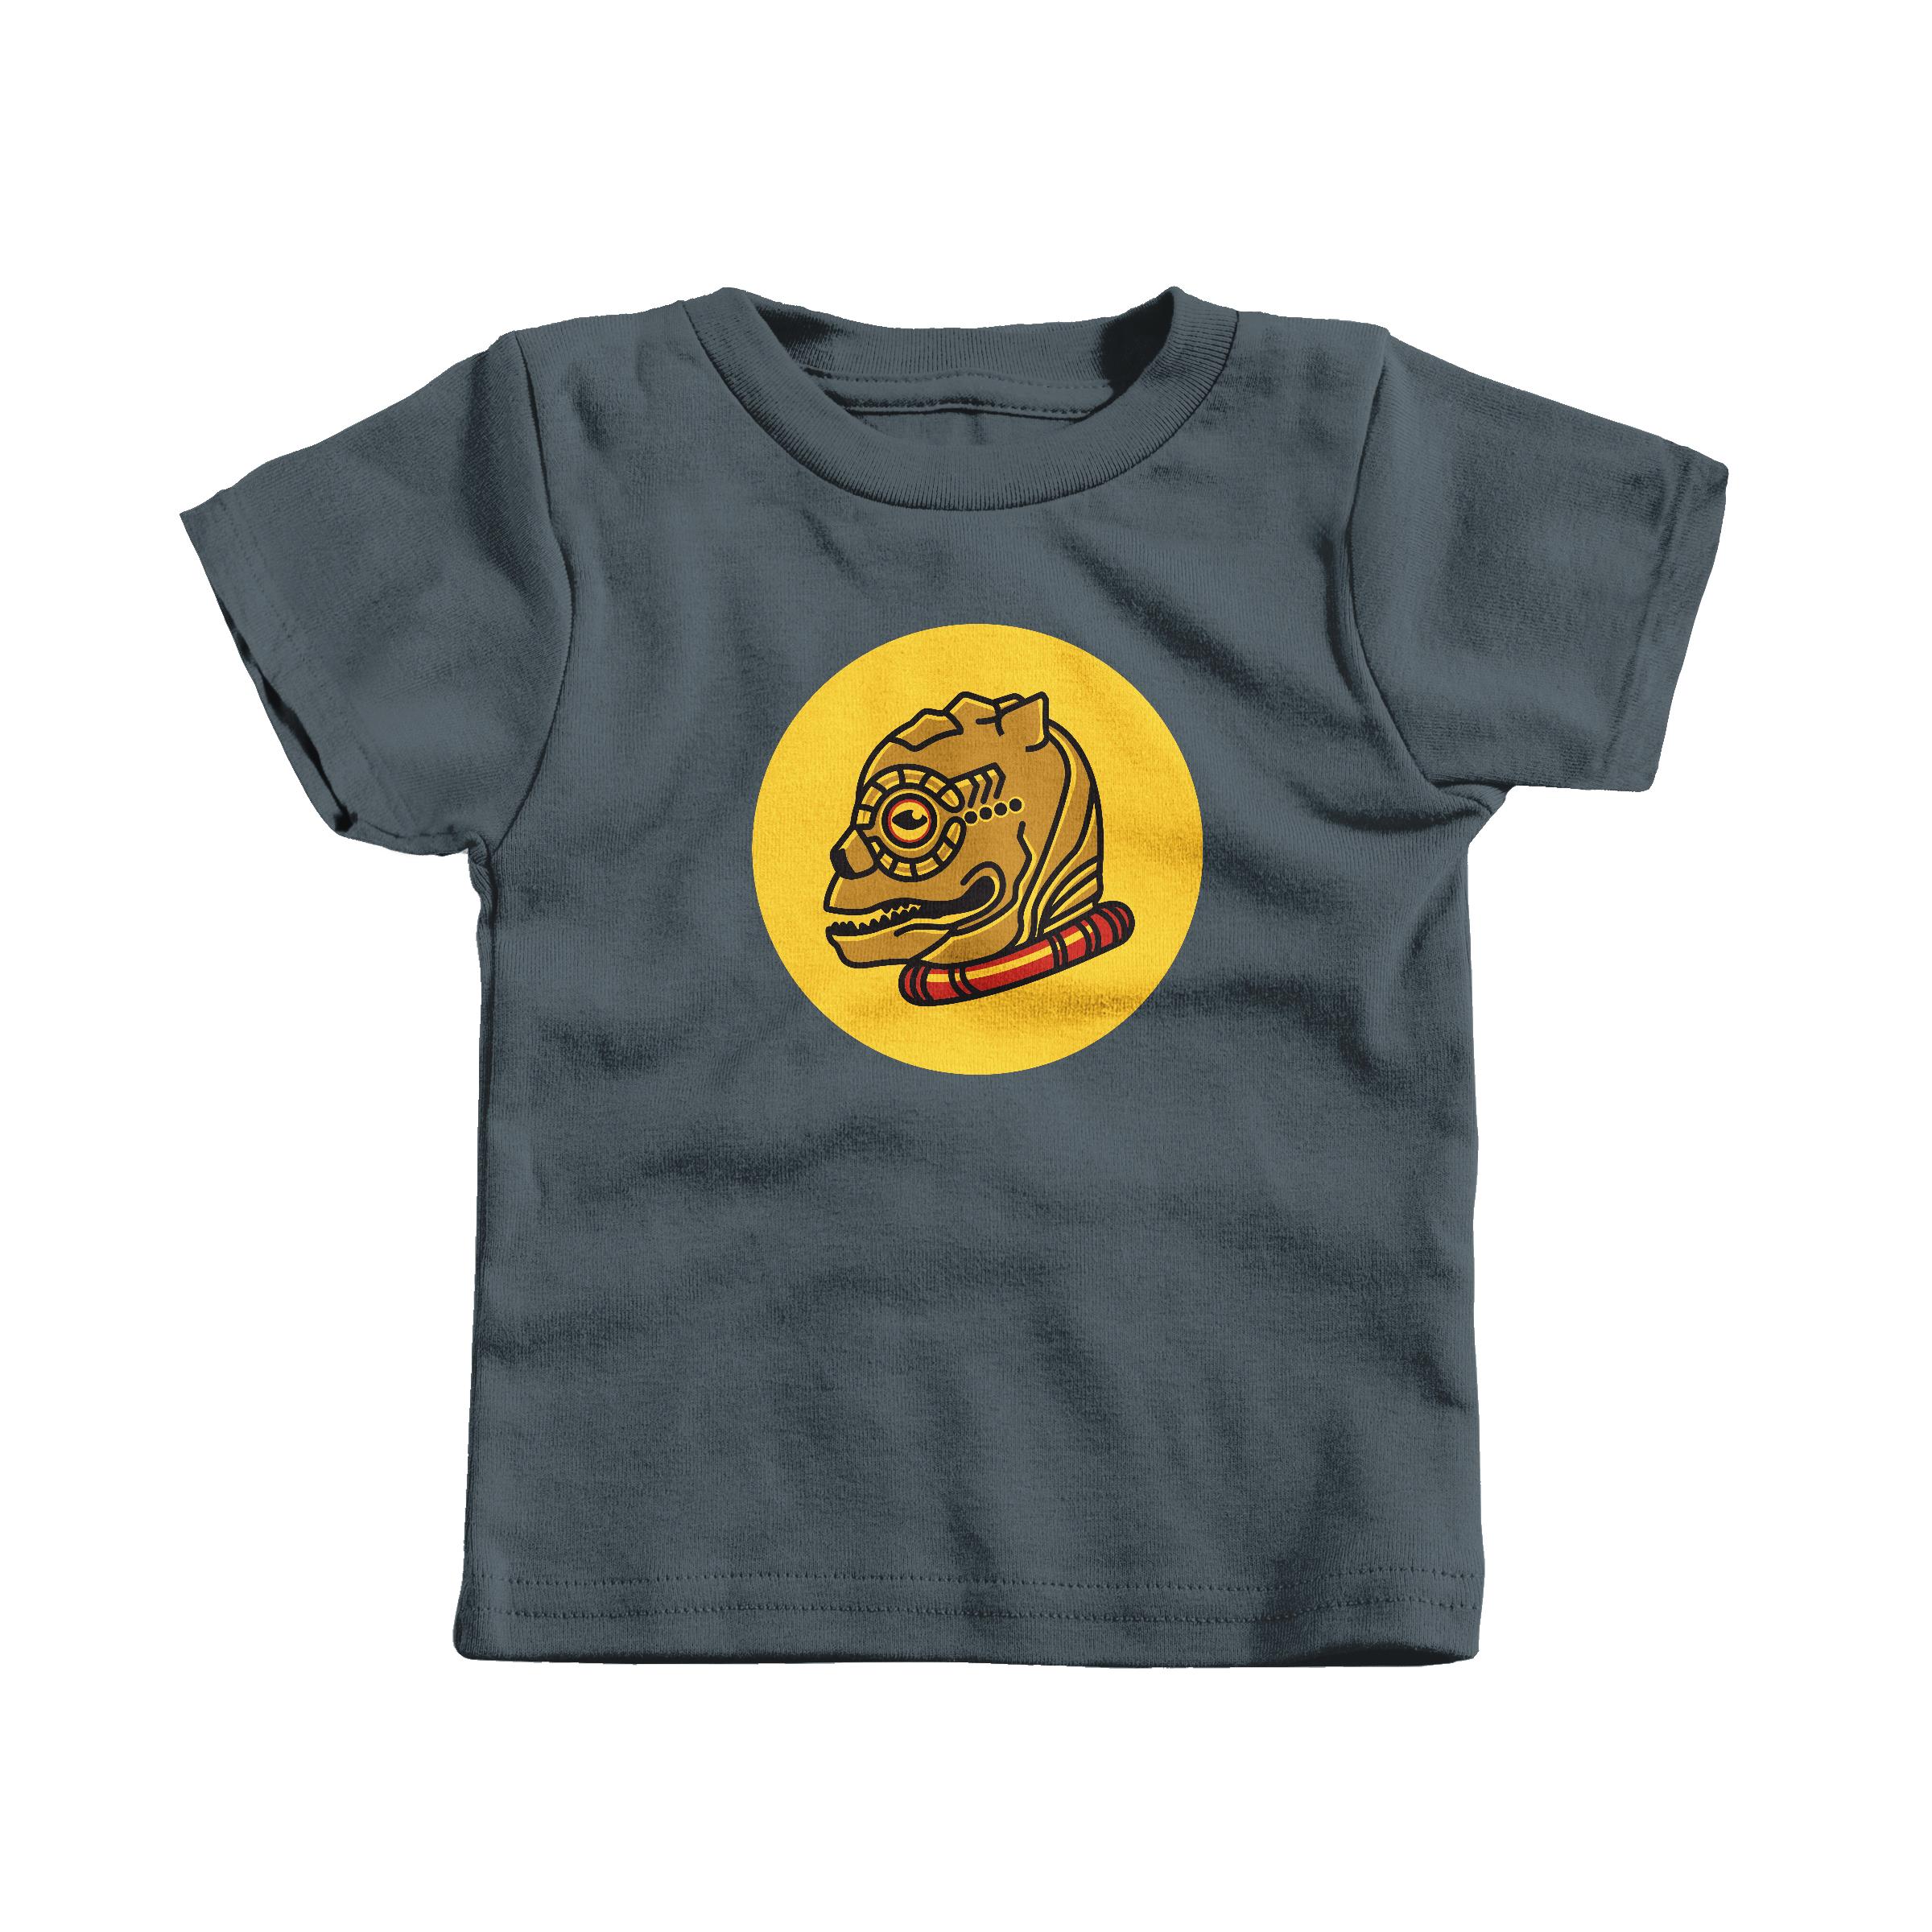 Bossk Charcoal (T-Shirt)